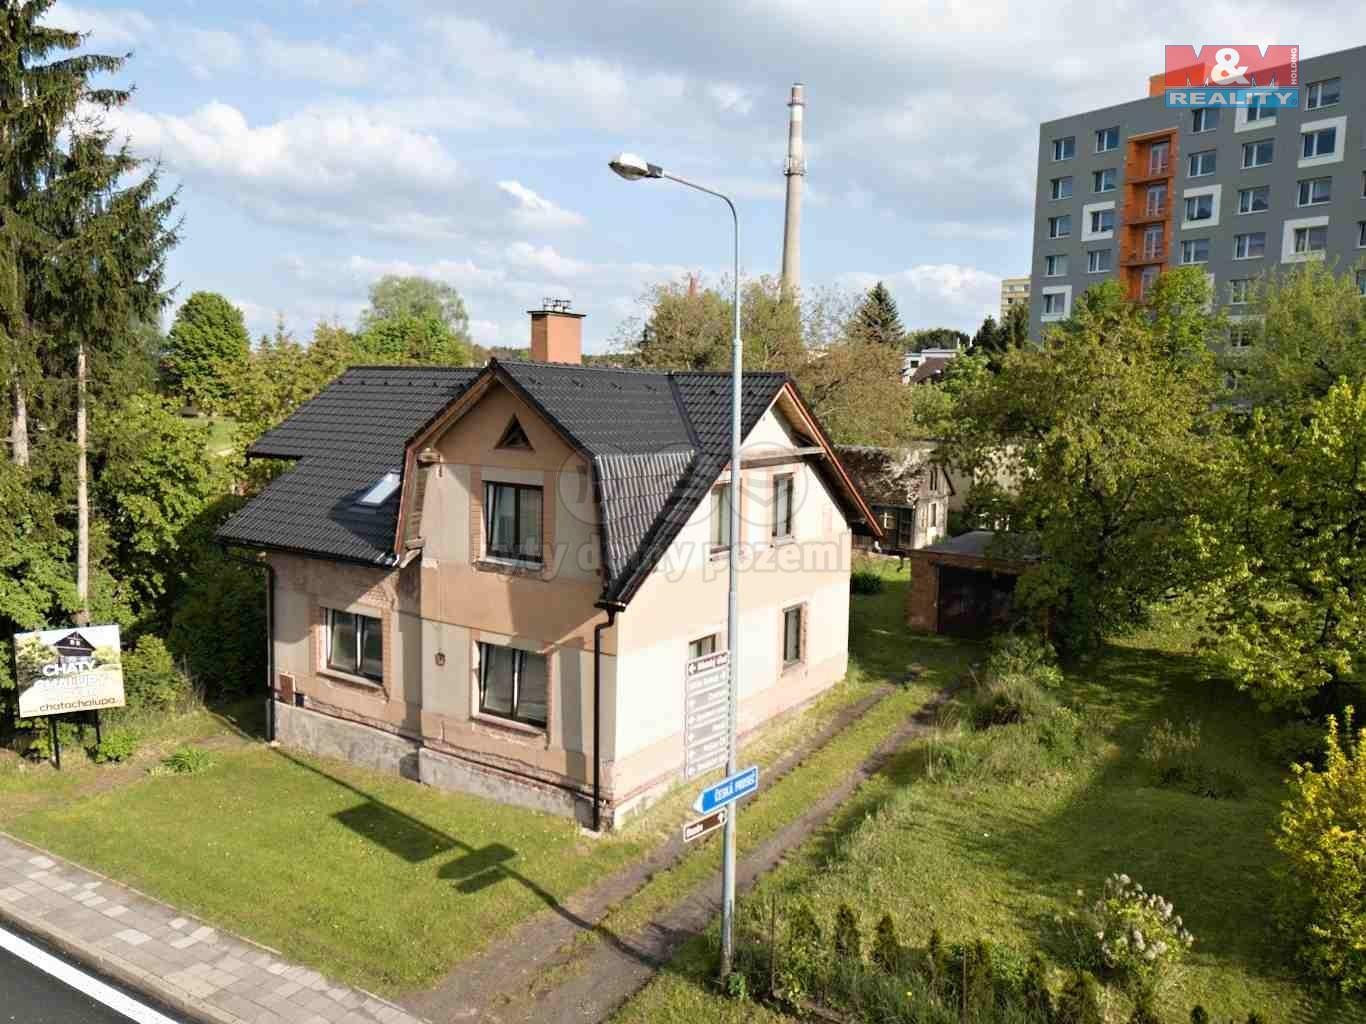 Prodej, rodinný dům 6+2, zahrada, 921 m2, Nová Paka